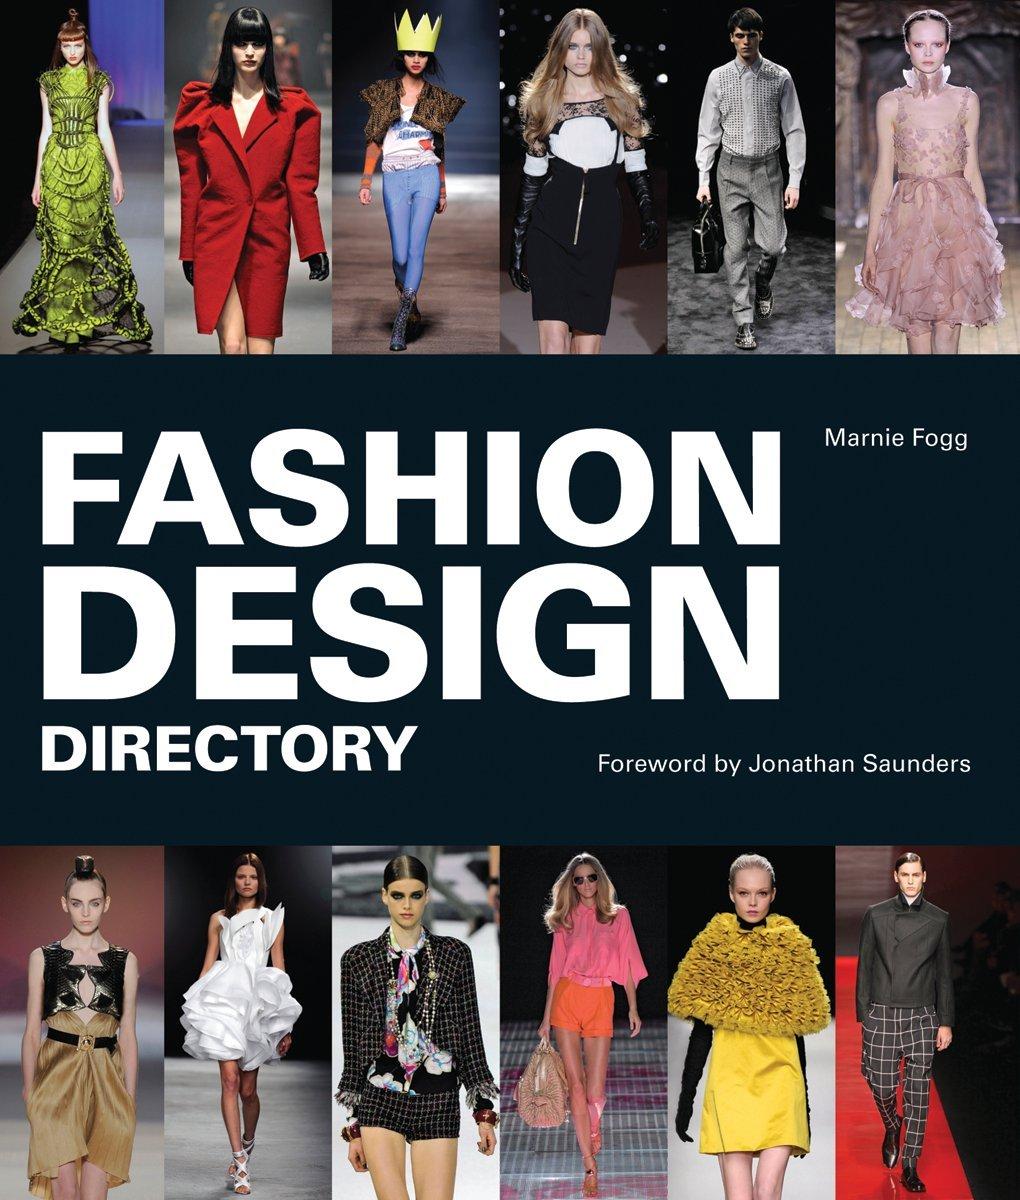 Fashion Design Directory Fogg Marnie Saunders Jonathan 9781554079117 Amazon Com Books